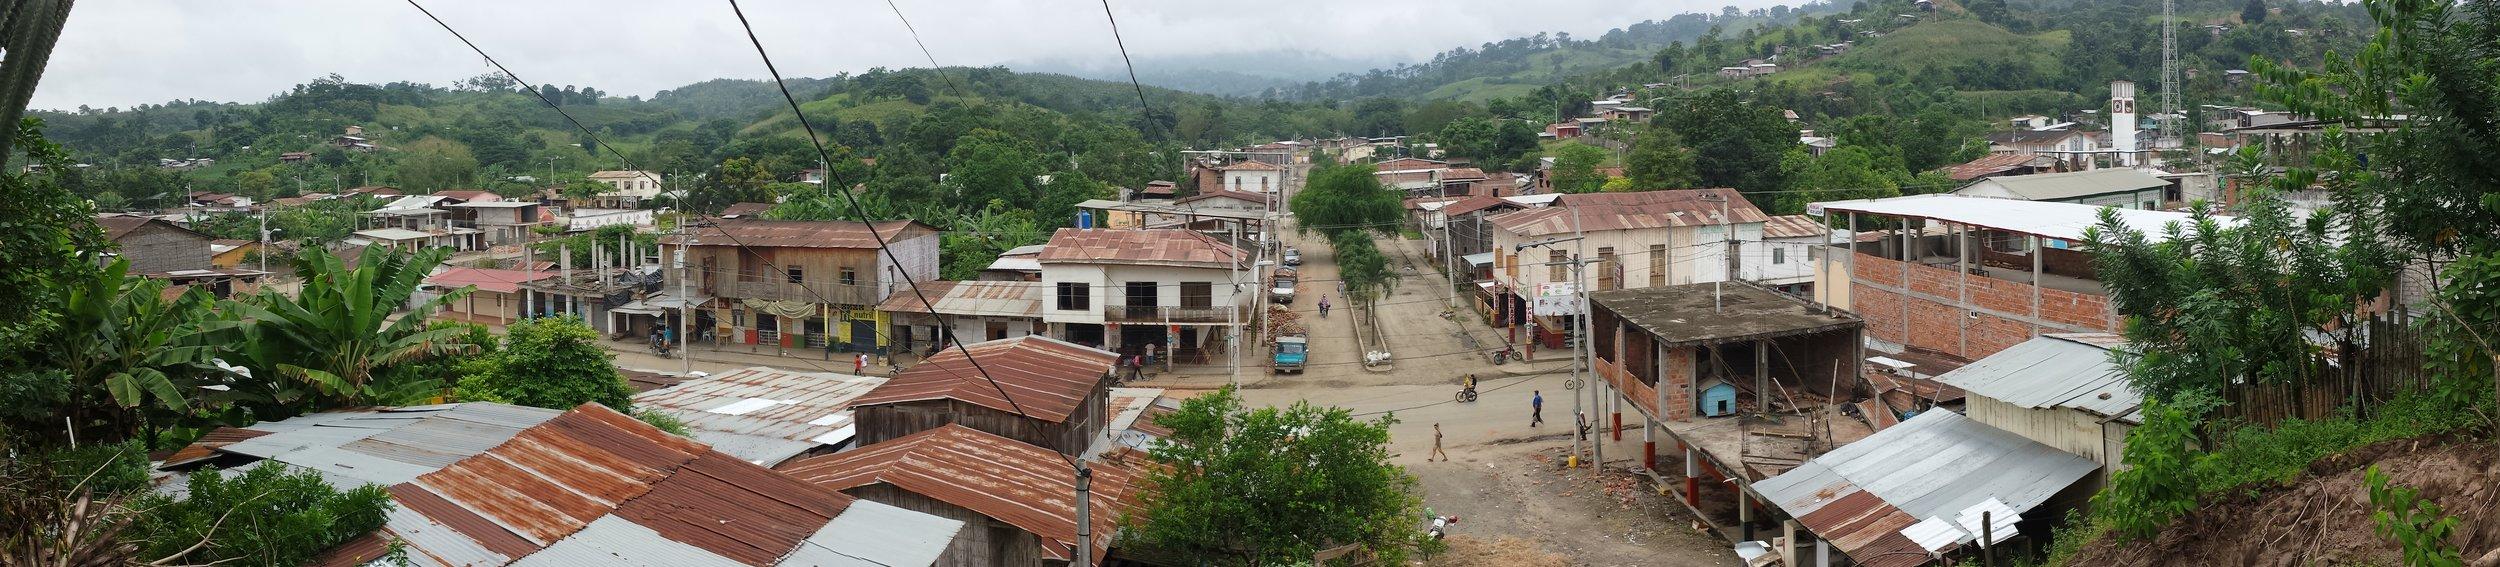 8 - San Isidro